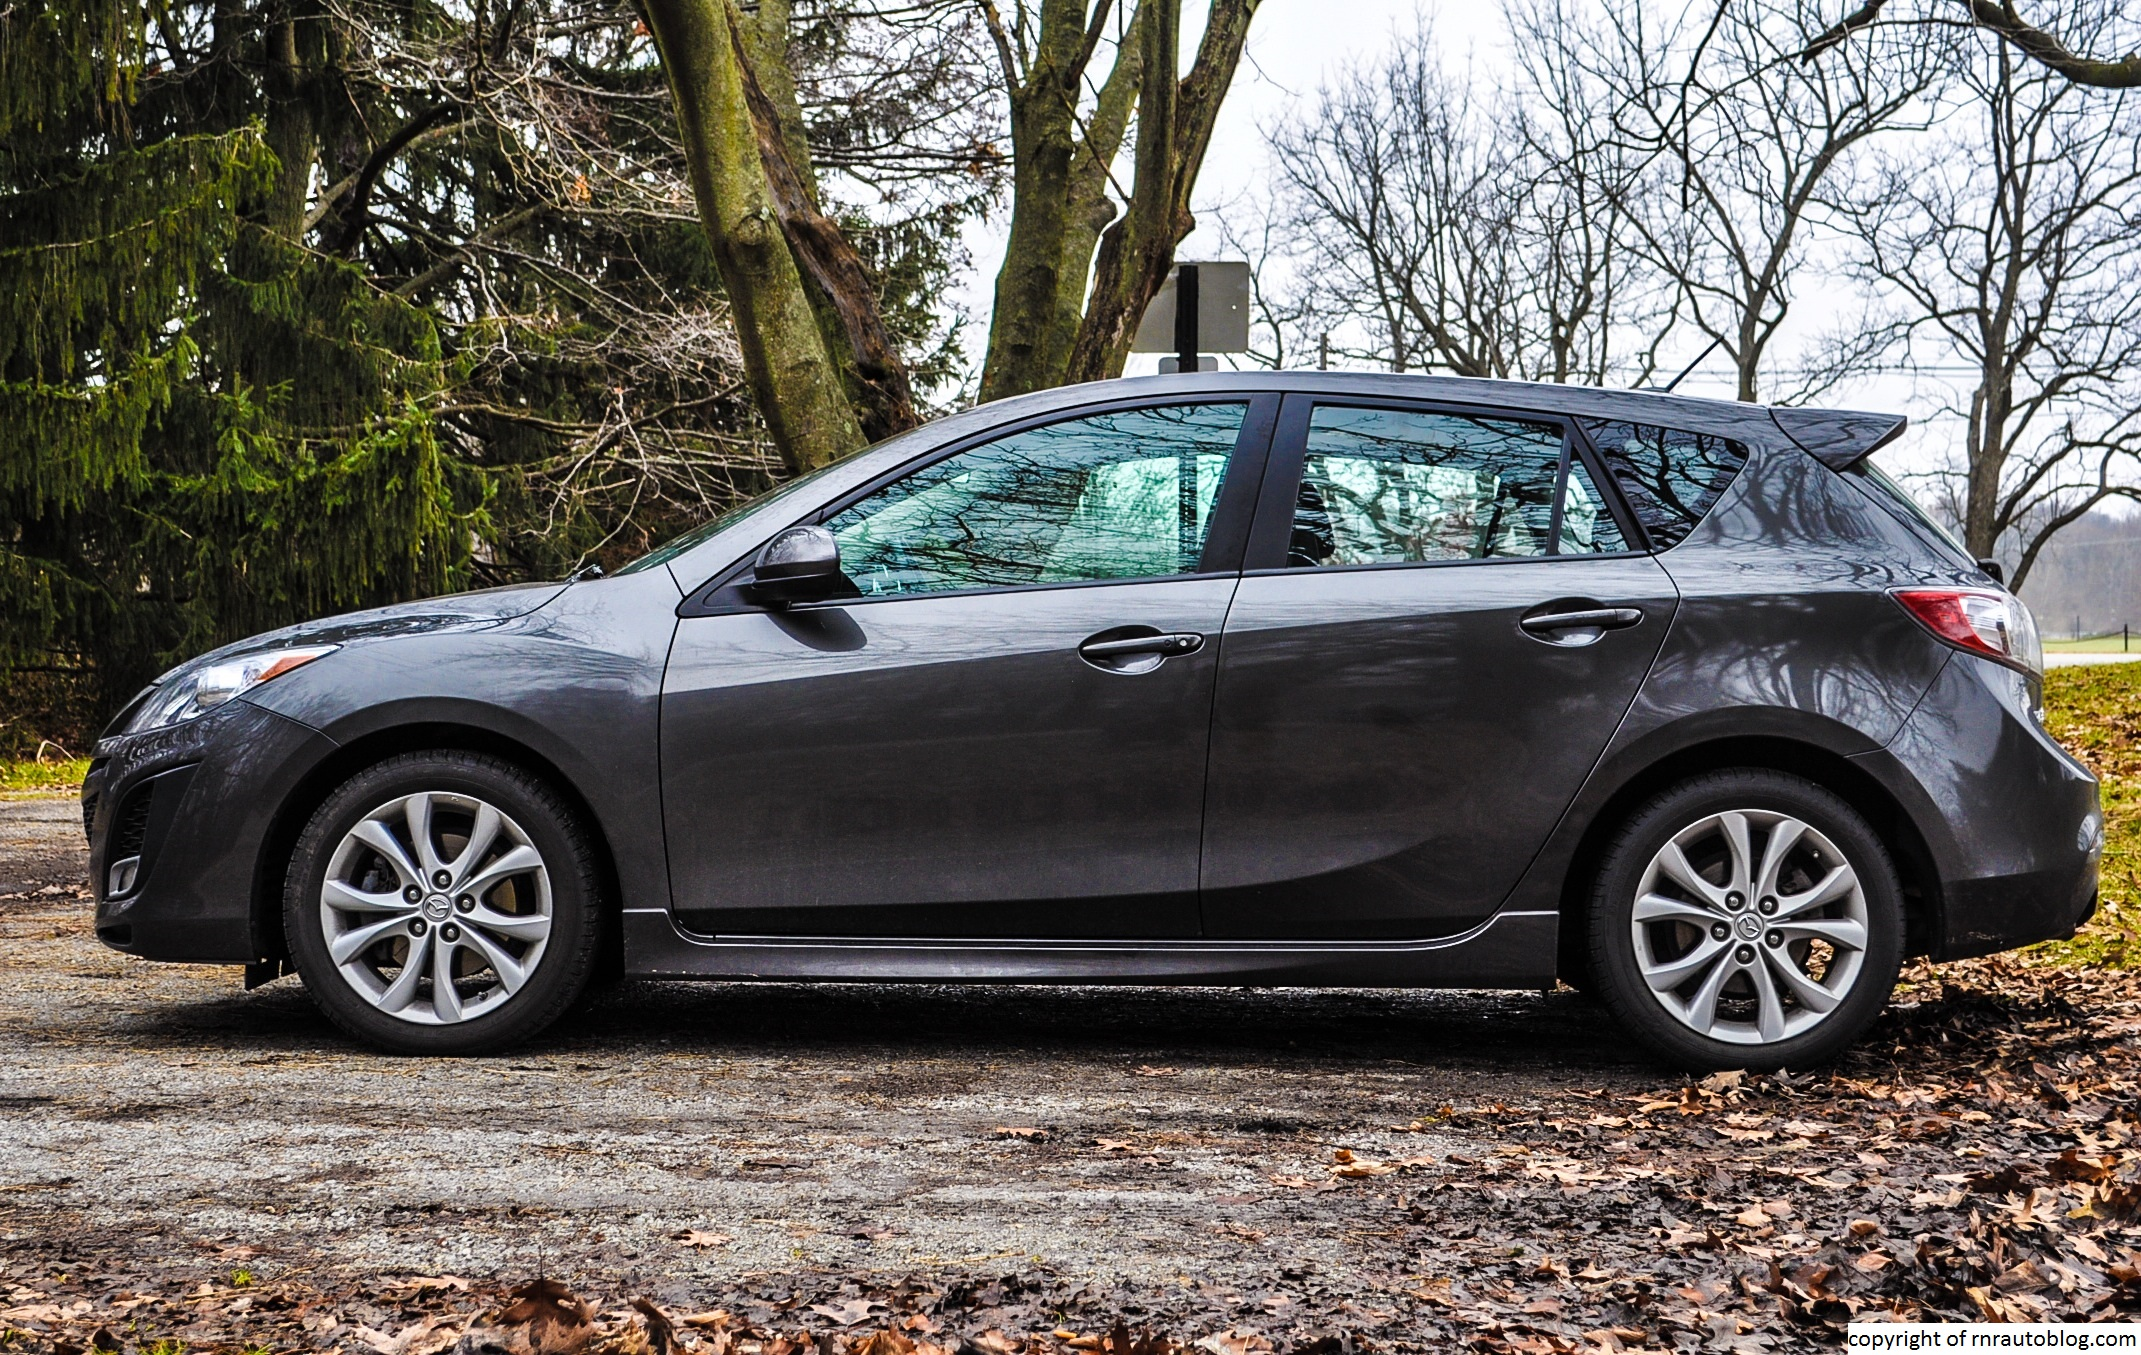 2011 mazda3 s grand touring review rnr automotive blog rh rnrautoblog com 2015 Mazda 3 manual for 2011 mazda 3